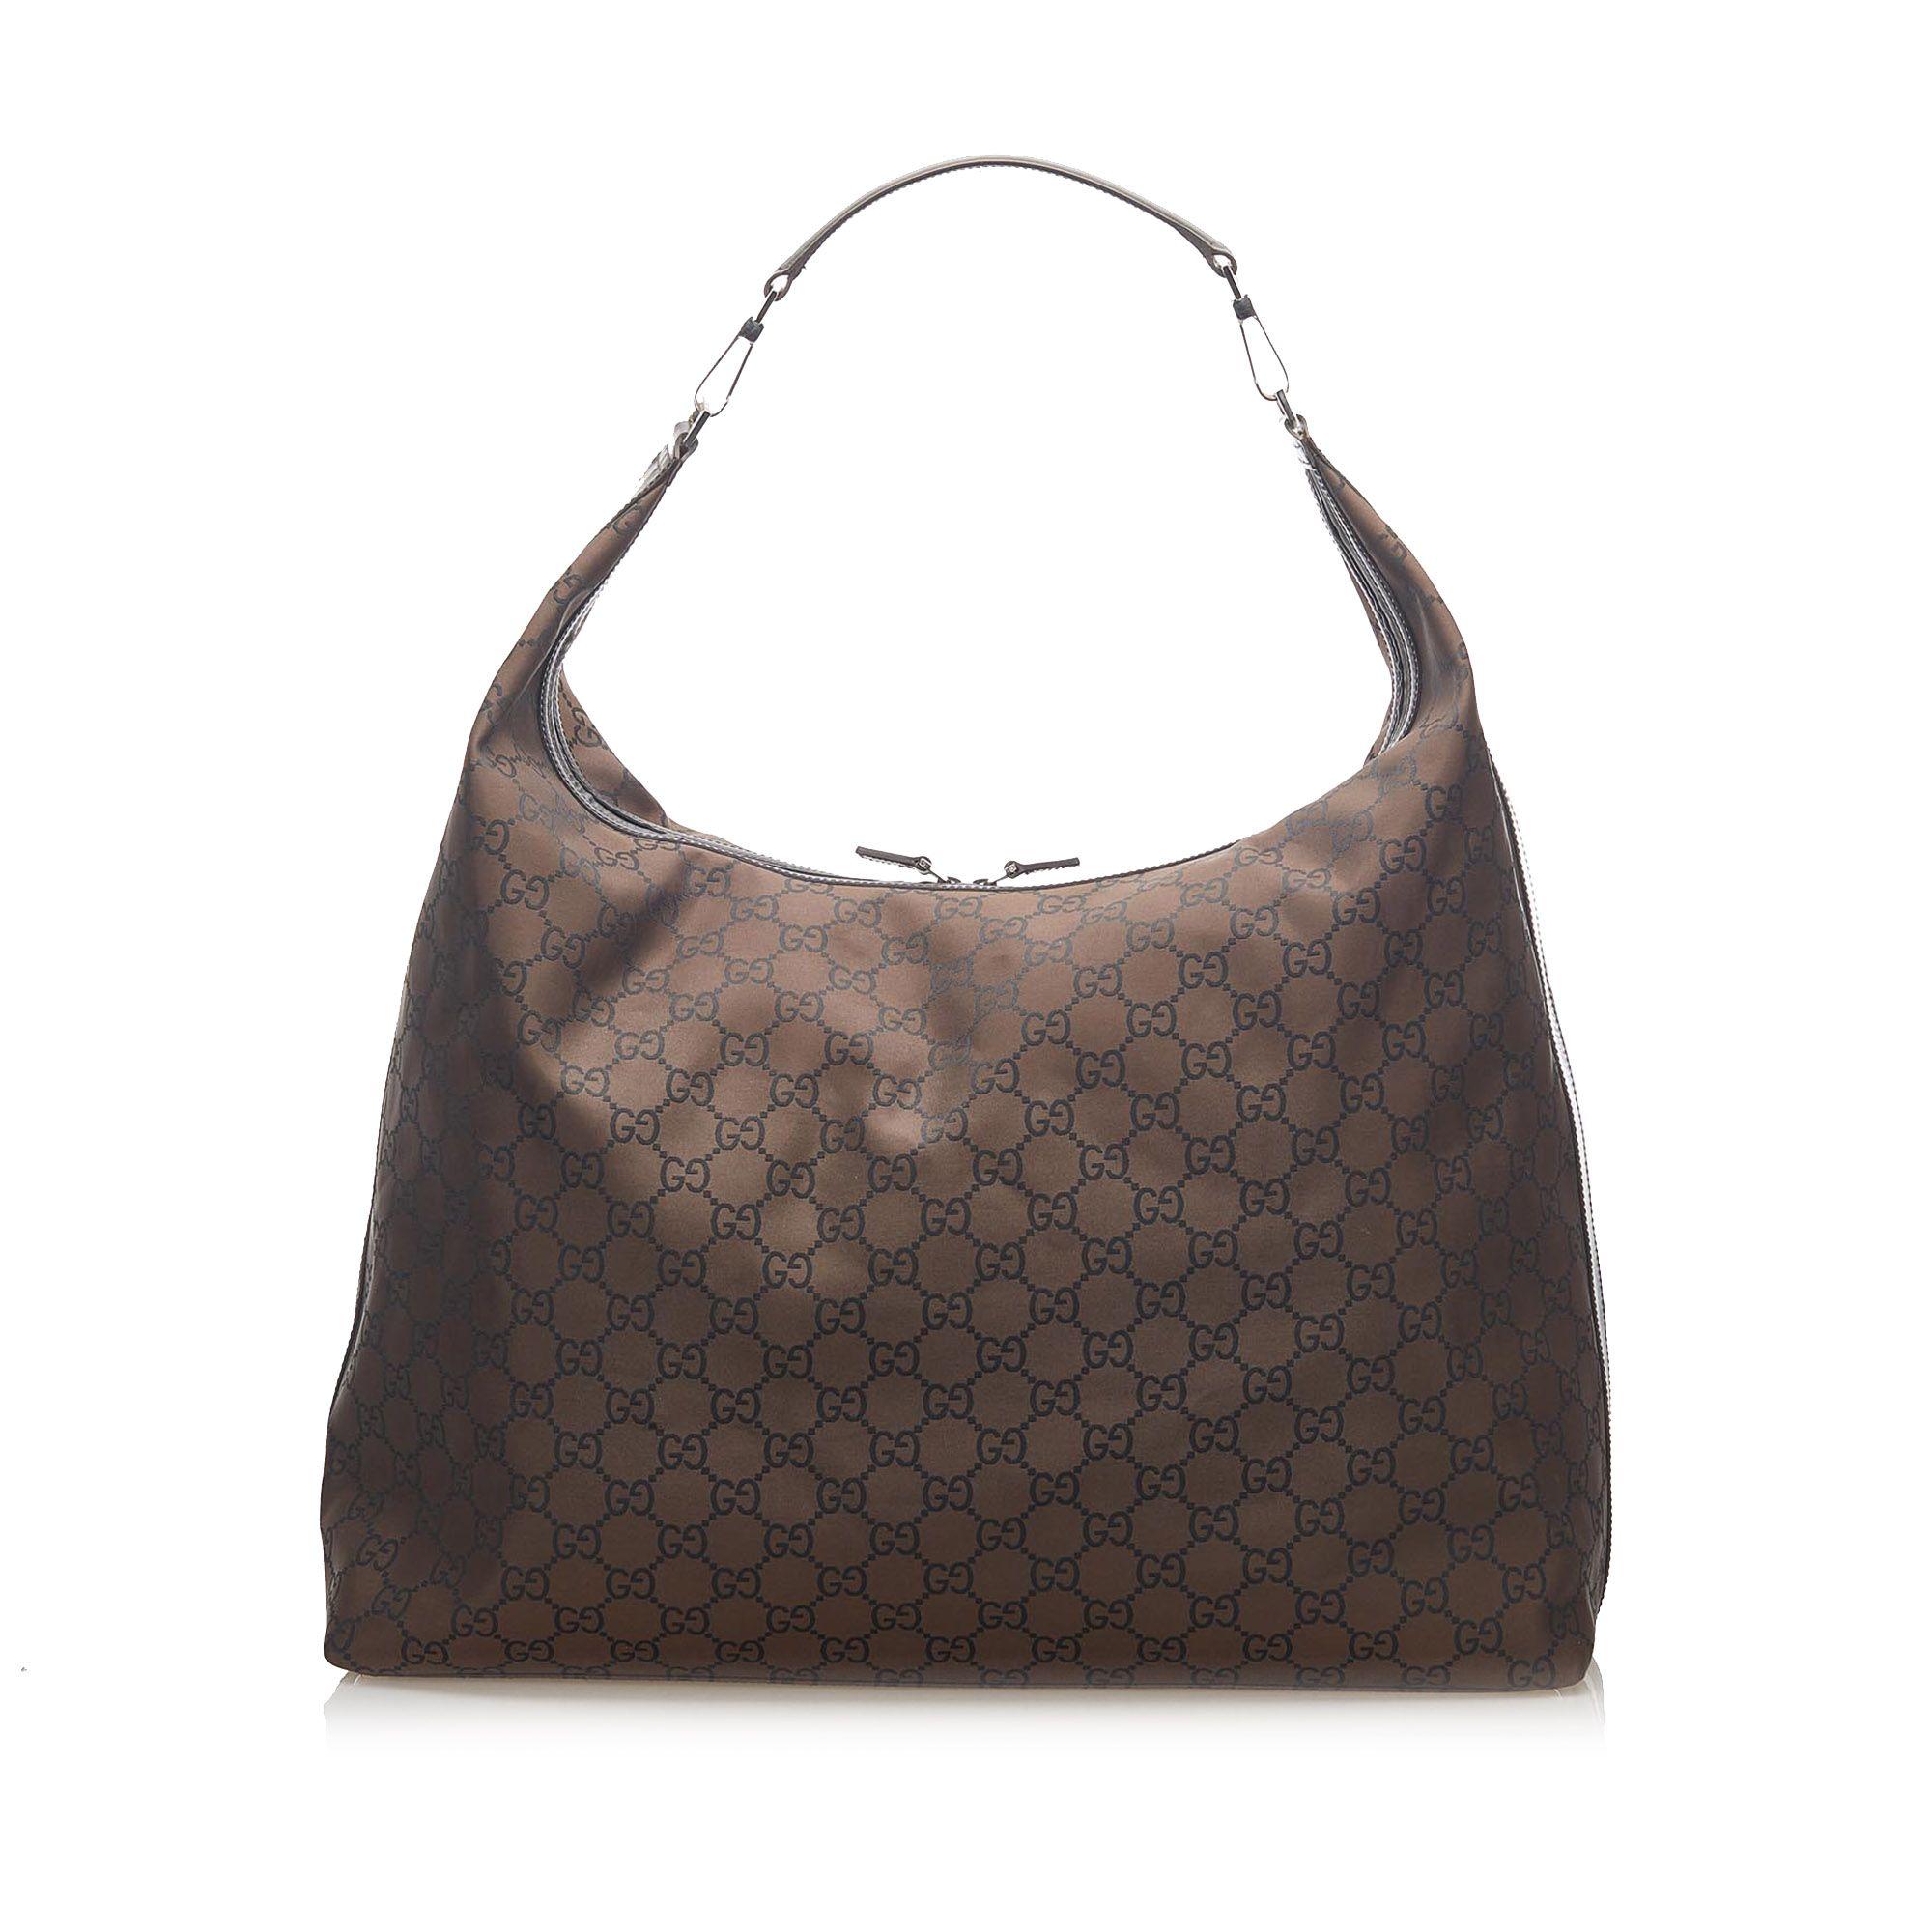 Vintage Gucci GG Nylon Travel Bag Brown